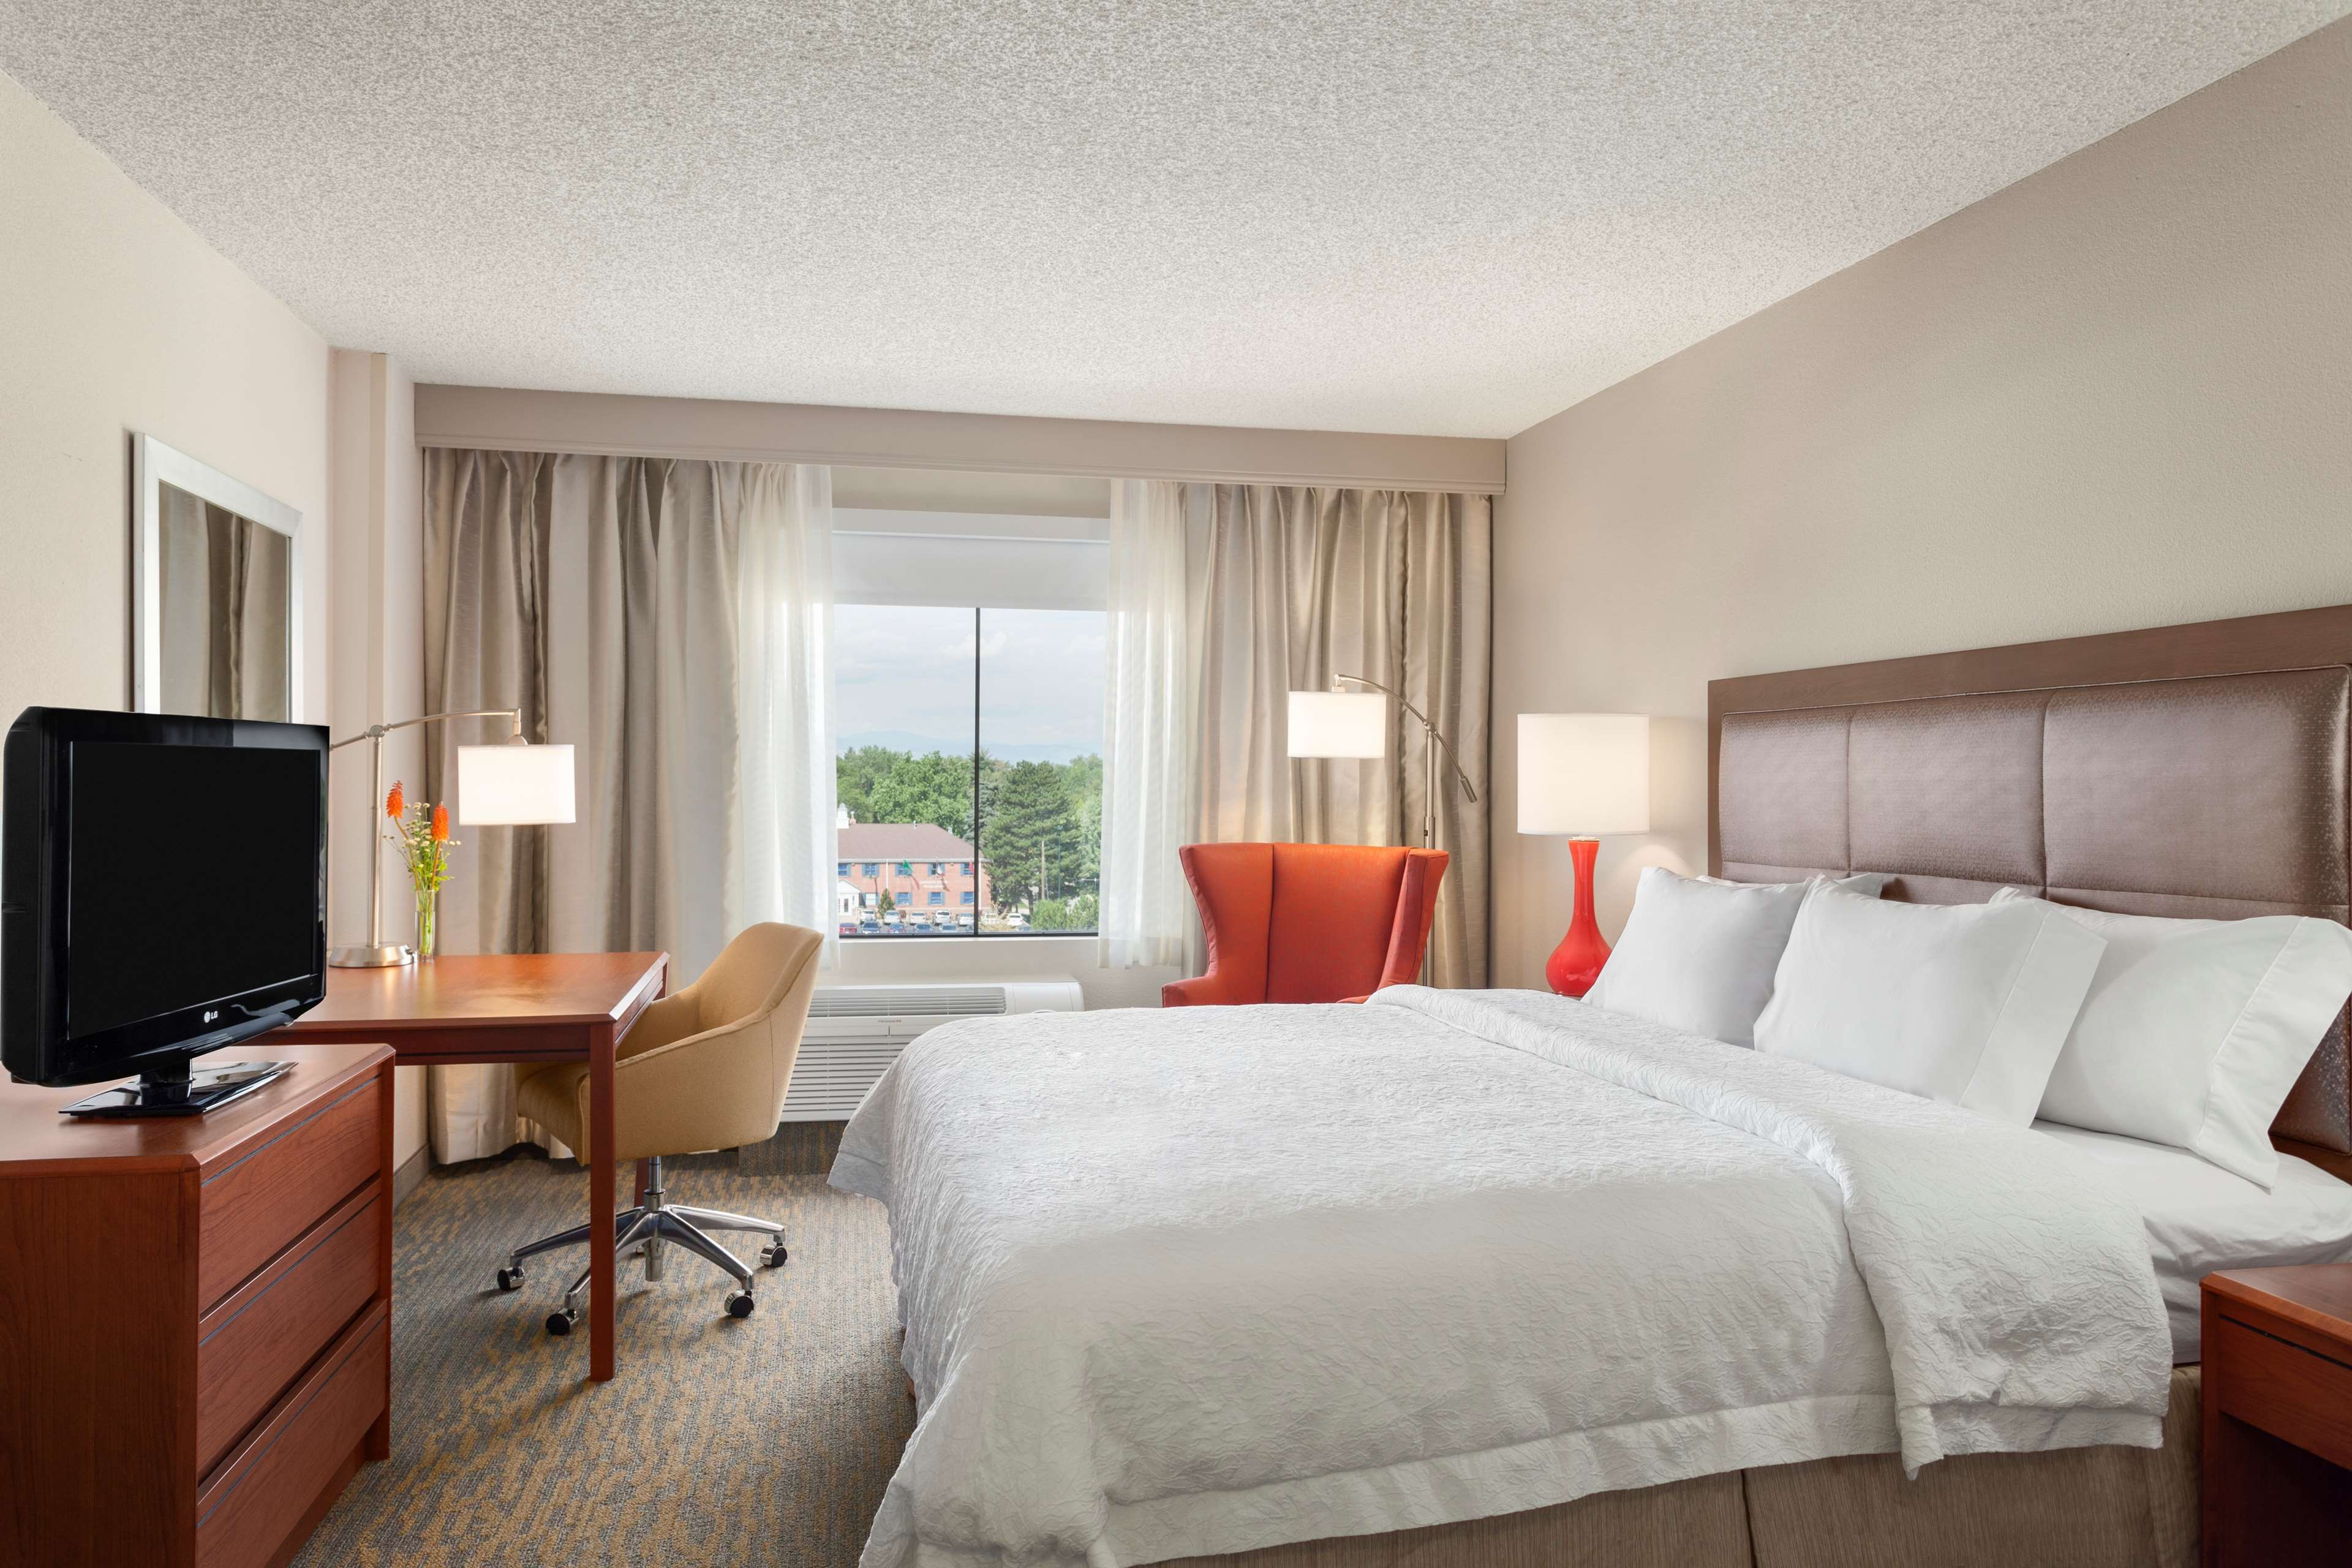 Hampton Inn & Suites Denver-Cherry Creek image 11